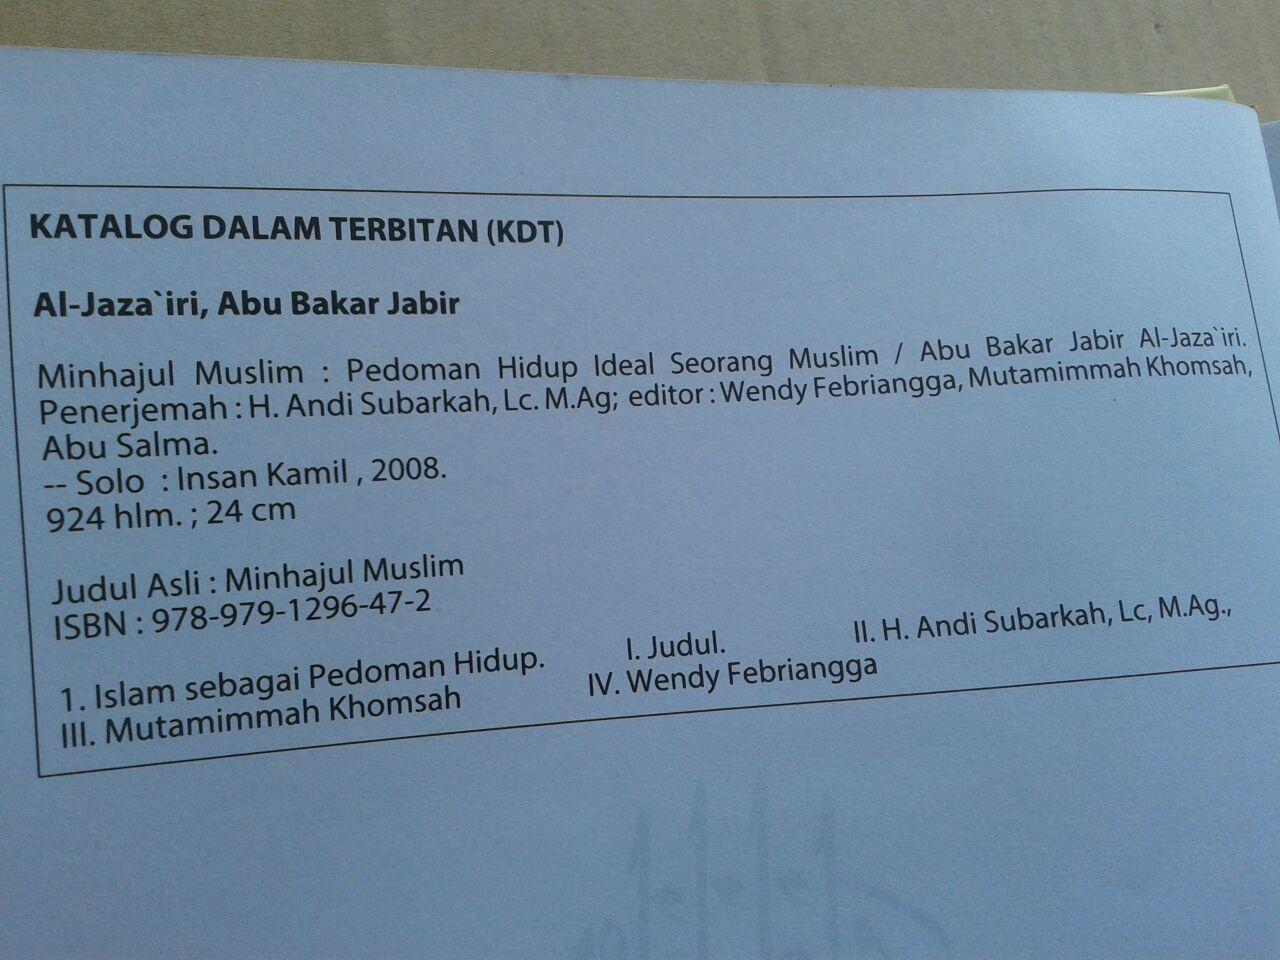 Buku Minhajul Muslim Pedoman Hidup Ideal Seorang Muslim isi 5